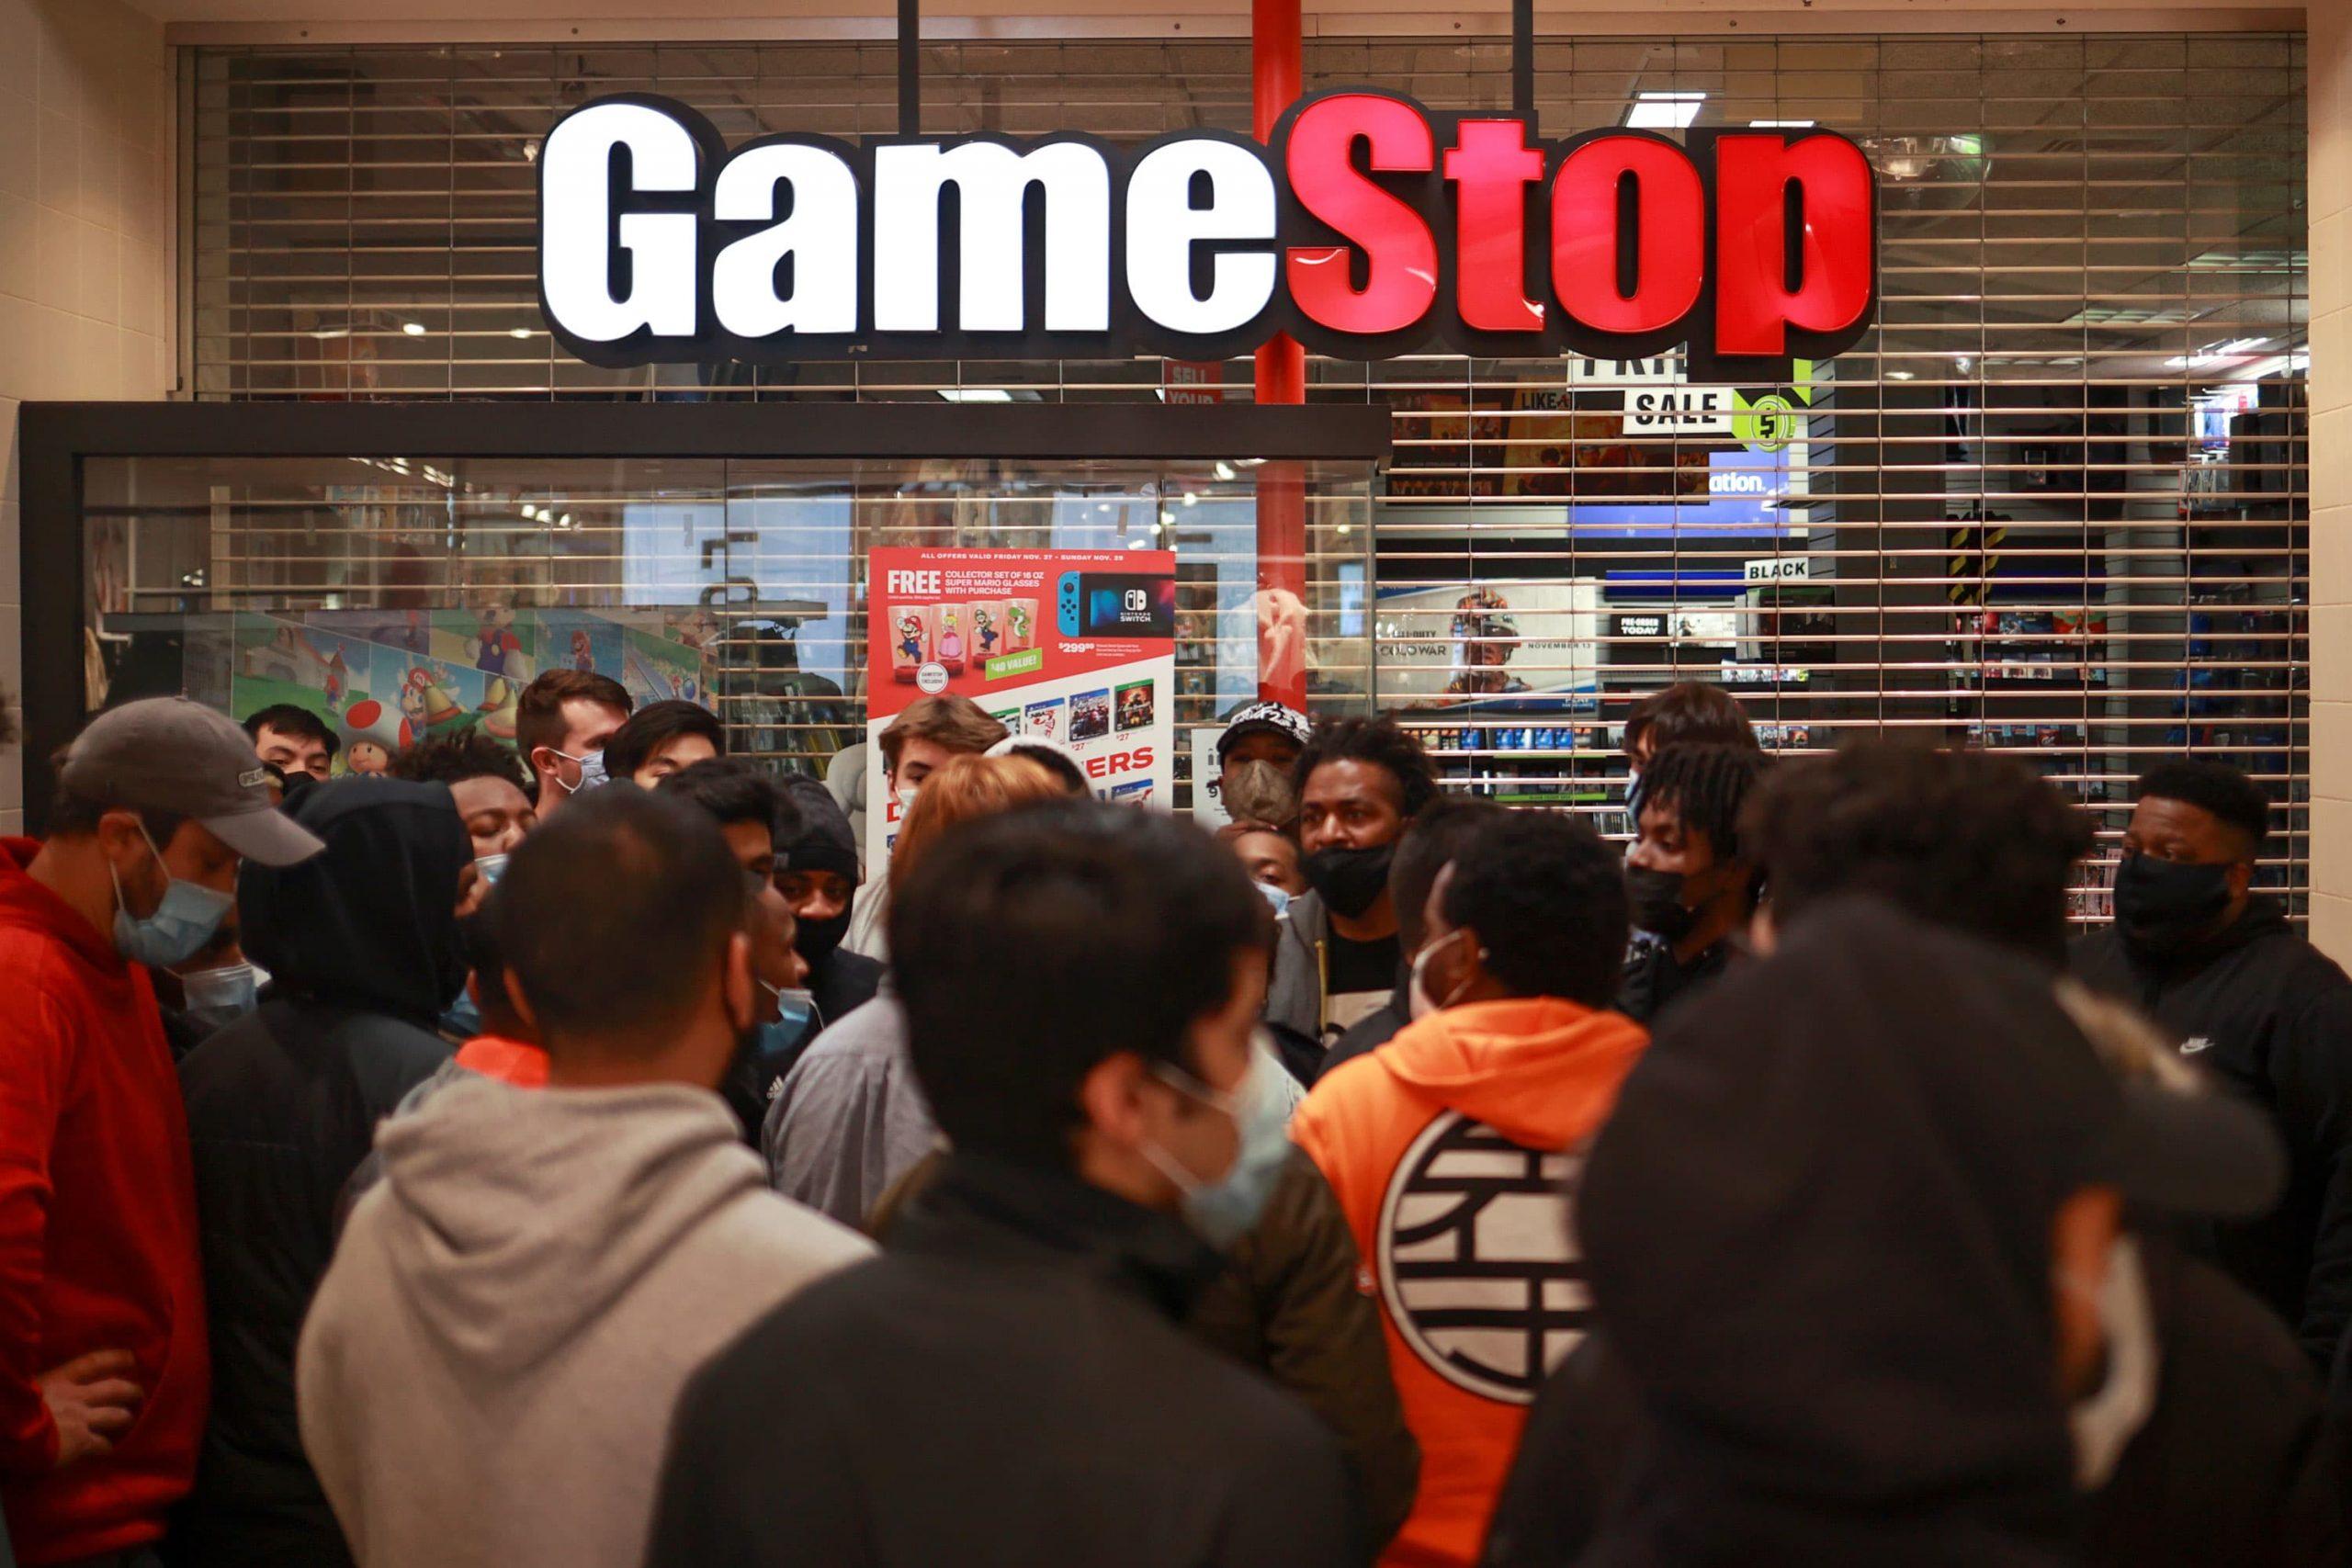 GameStop, Box, WW International & more